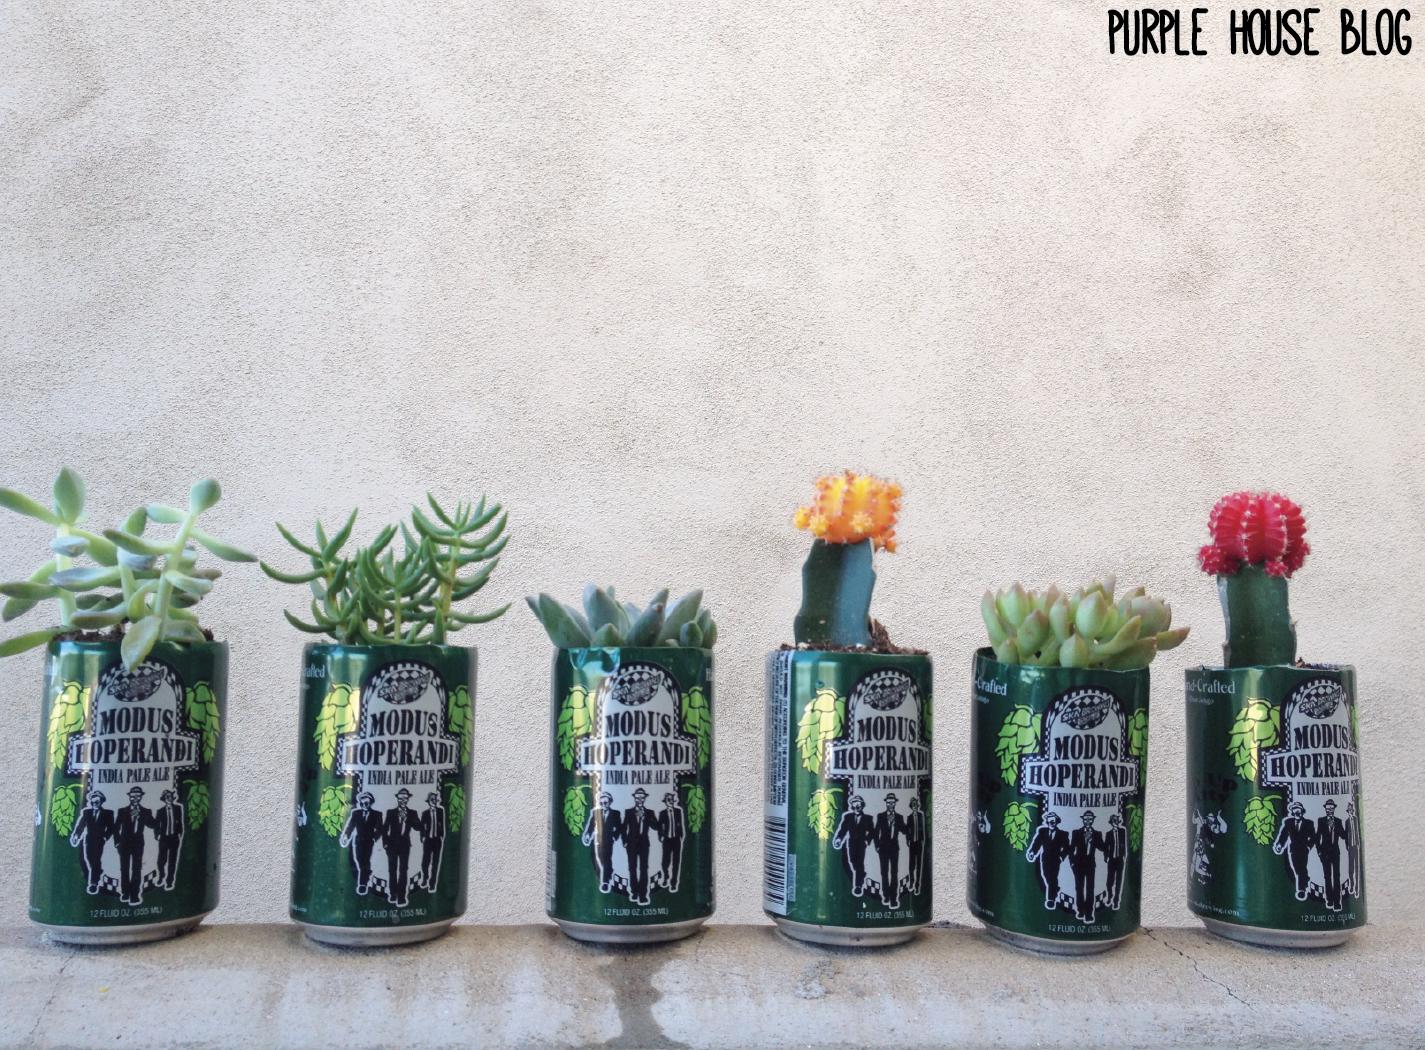 beer can planter DIY purplehouseblogwordpresscom DIY